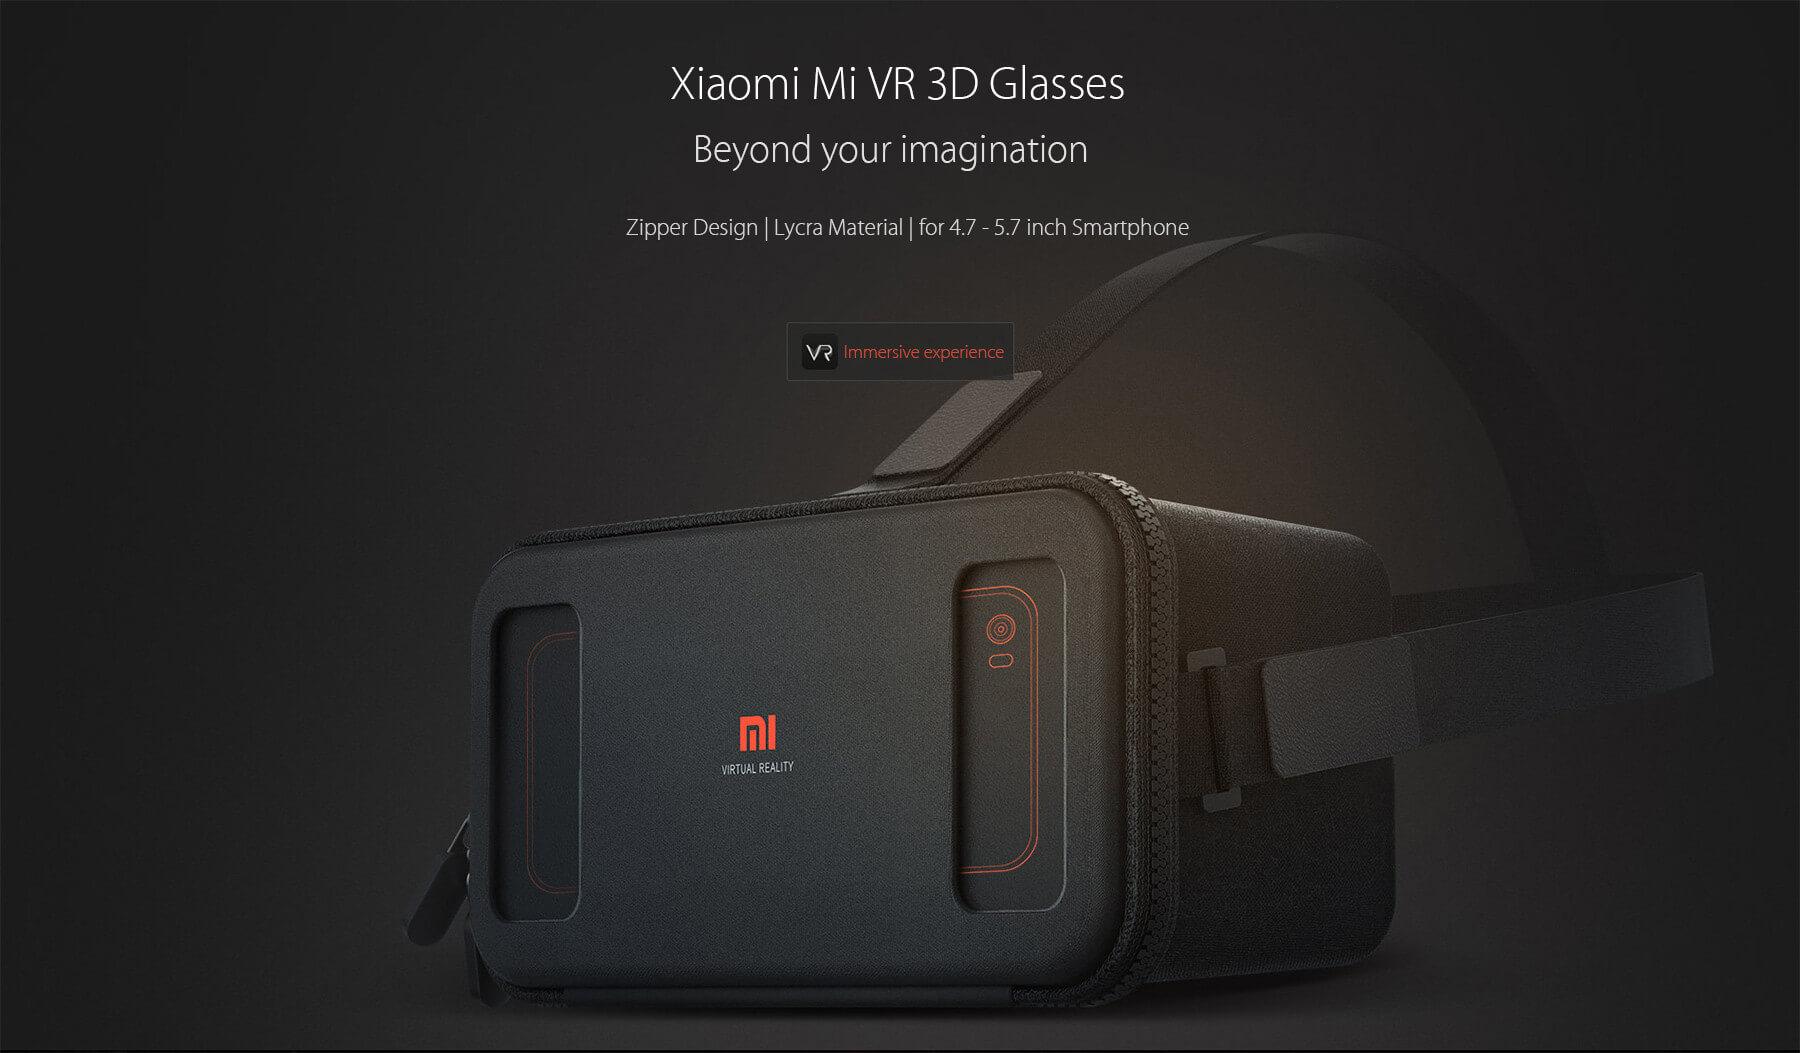 xiaomi-mi-vr-3d-glasses